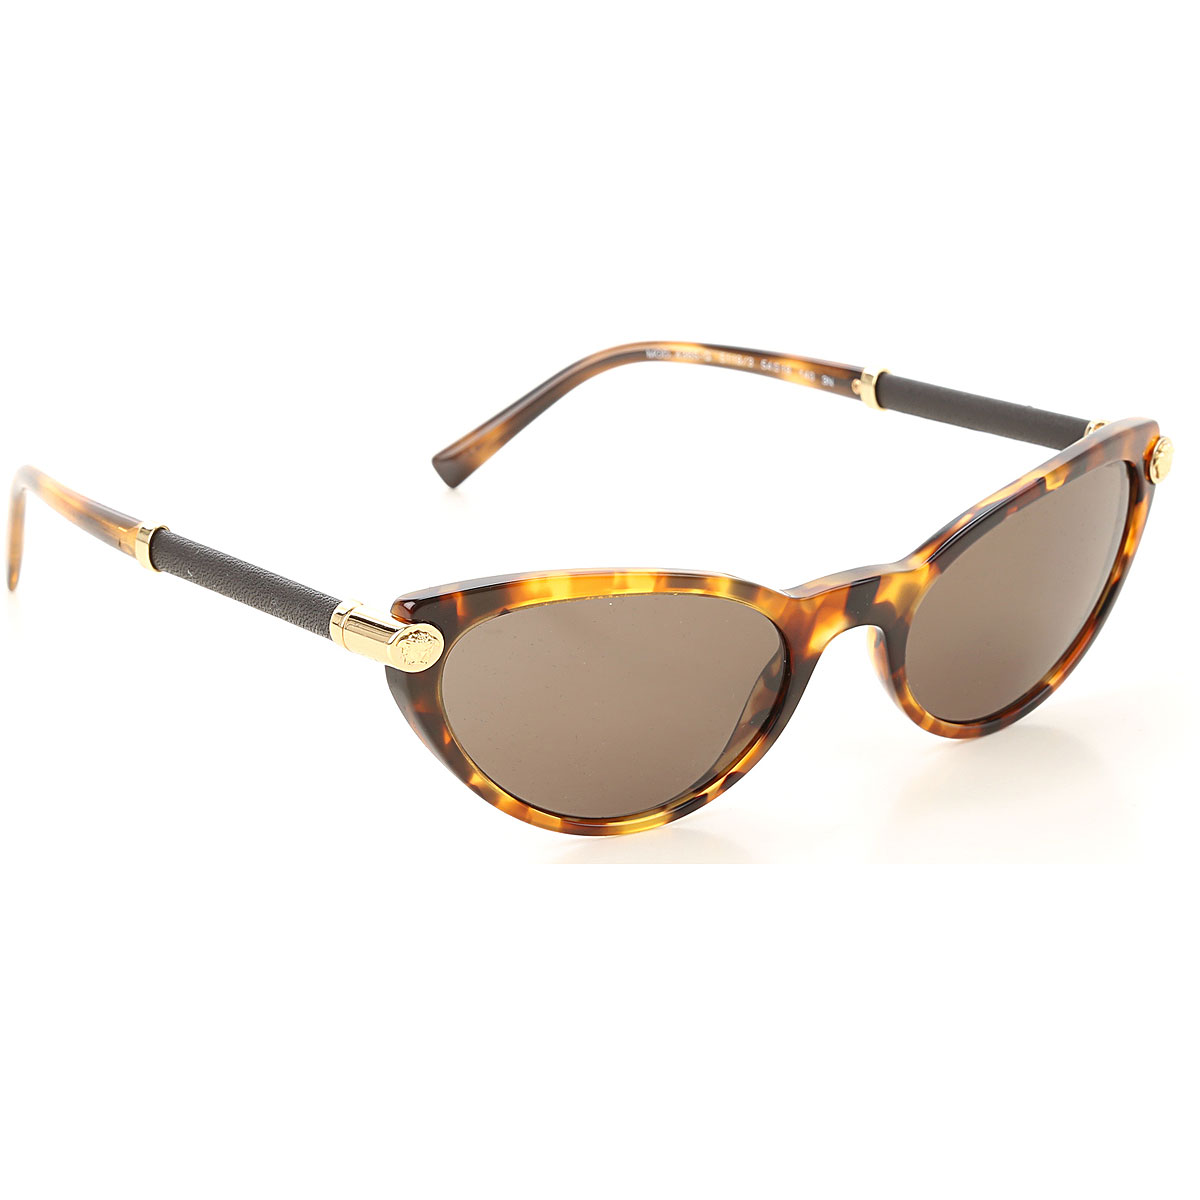 Gianni Versace Sunglasses On Sale, Blonde Havana, 2019